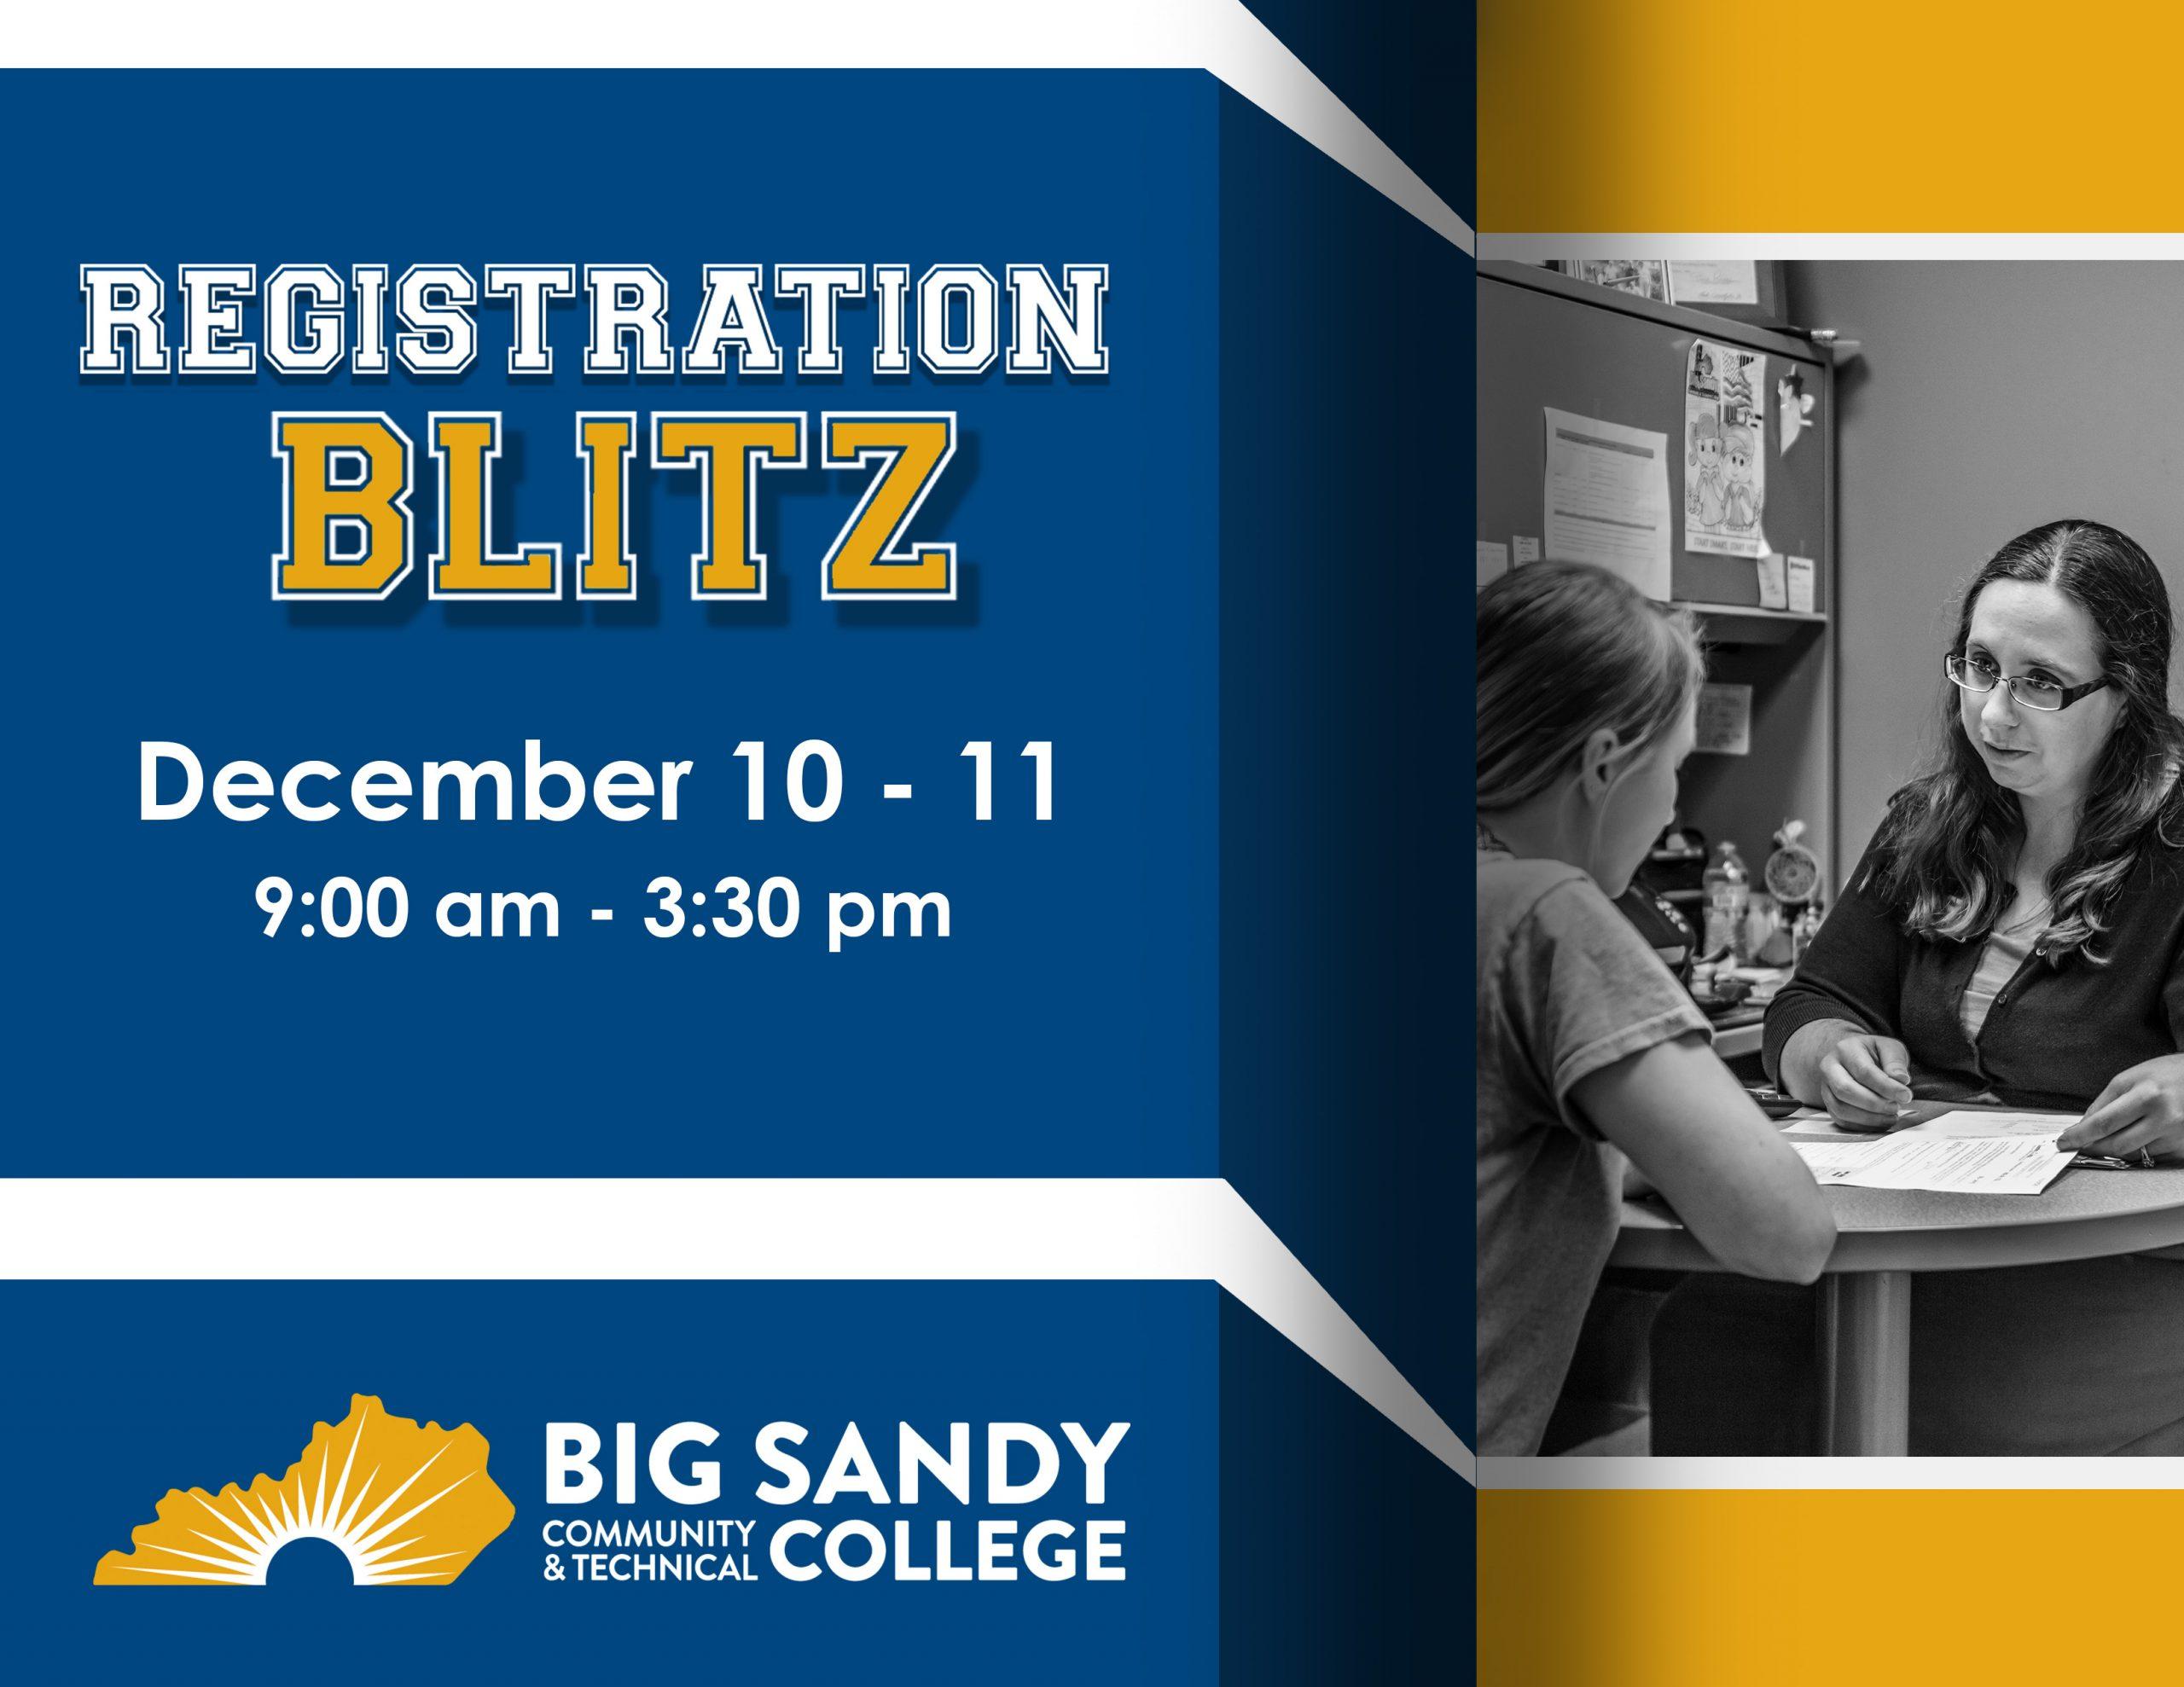 BSCTC Registration Blitz Set for December 11, 12